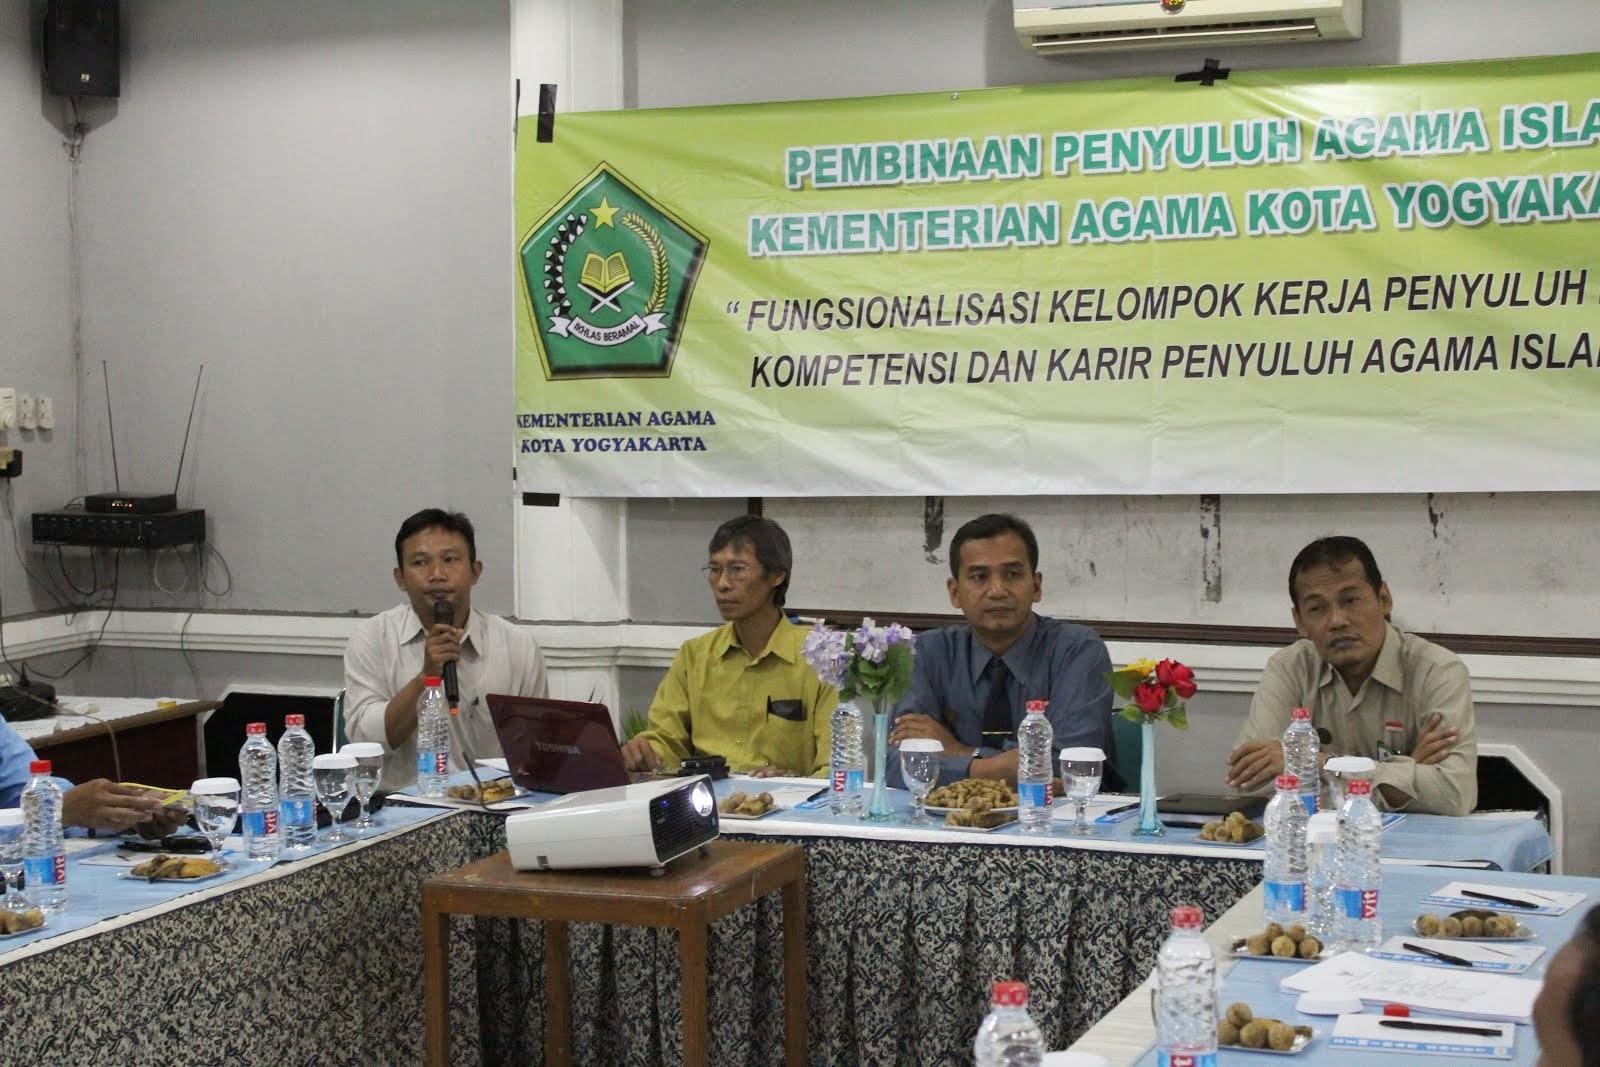 Kegiatan Pokja Penyuluh Kota Yogyakarta